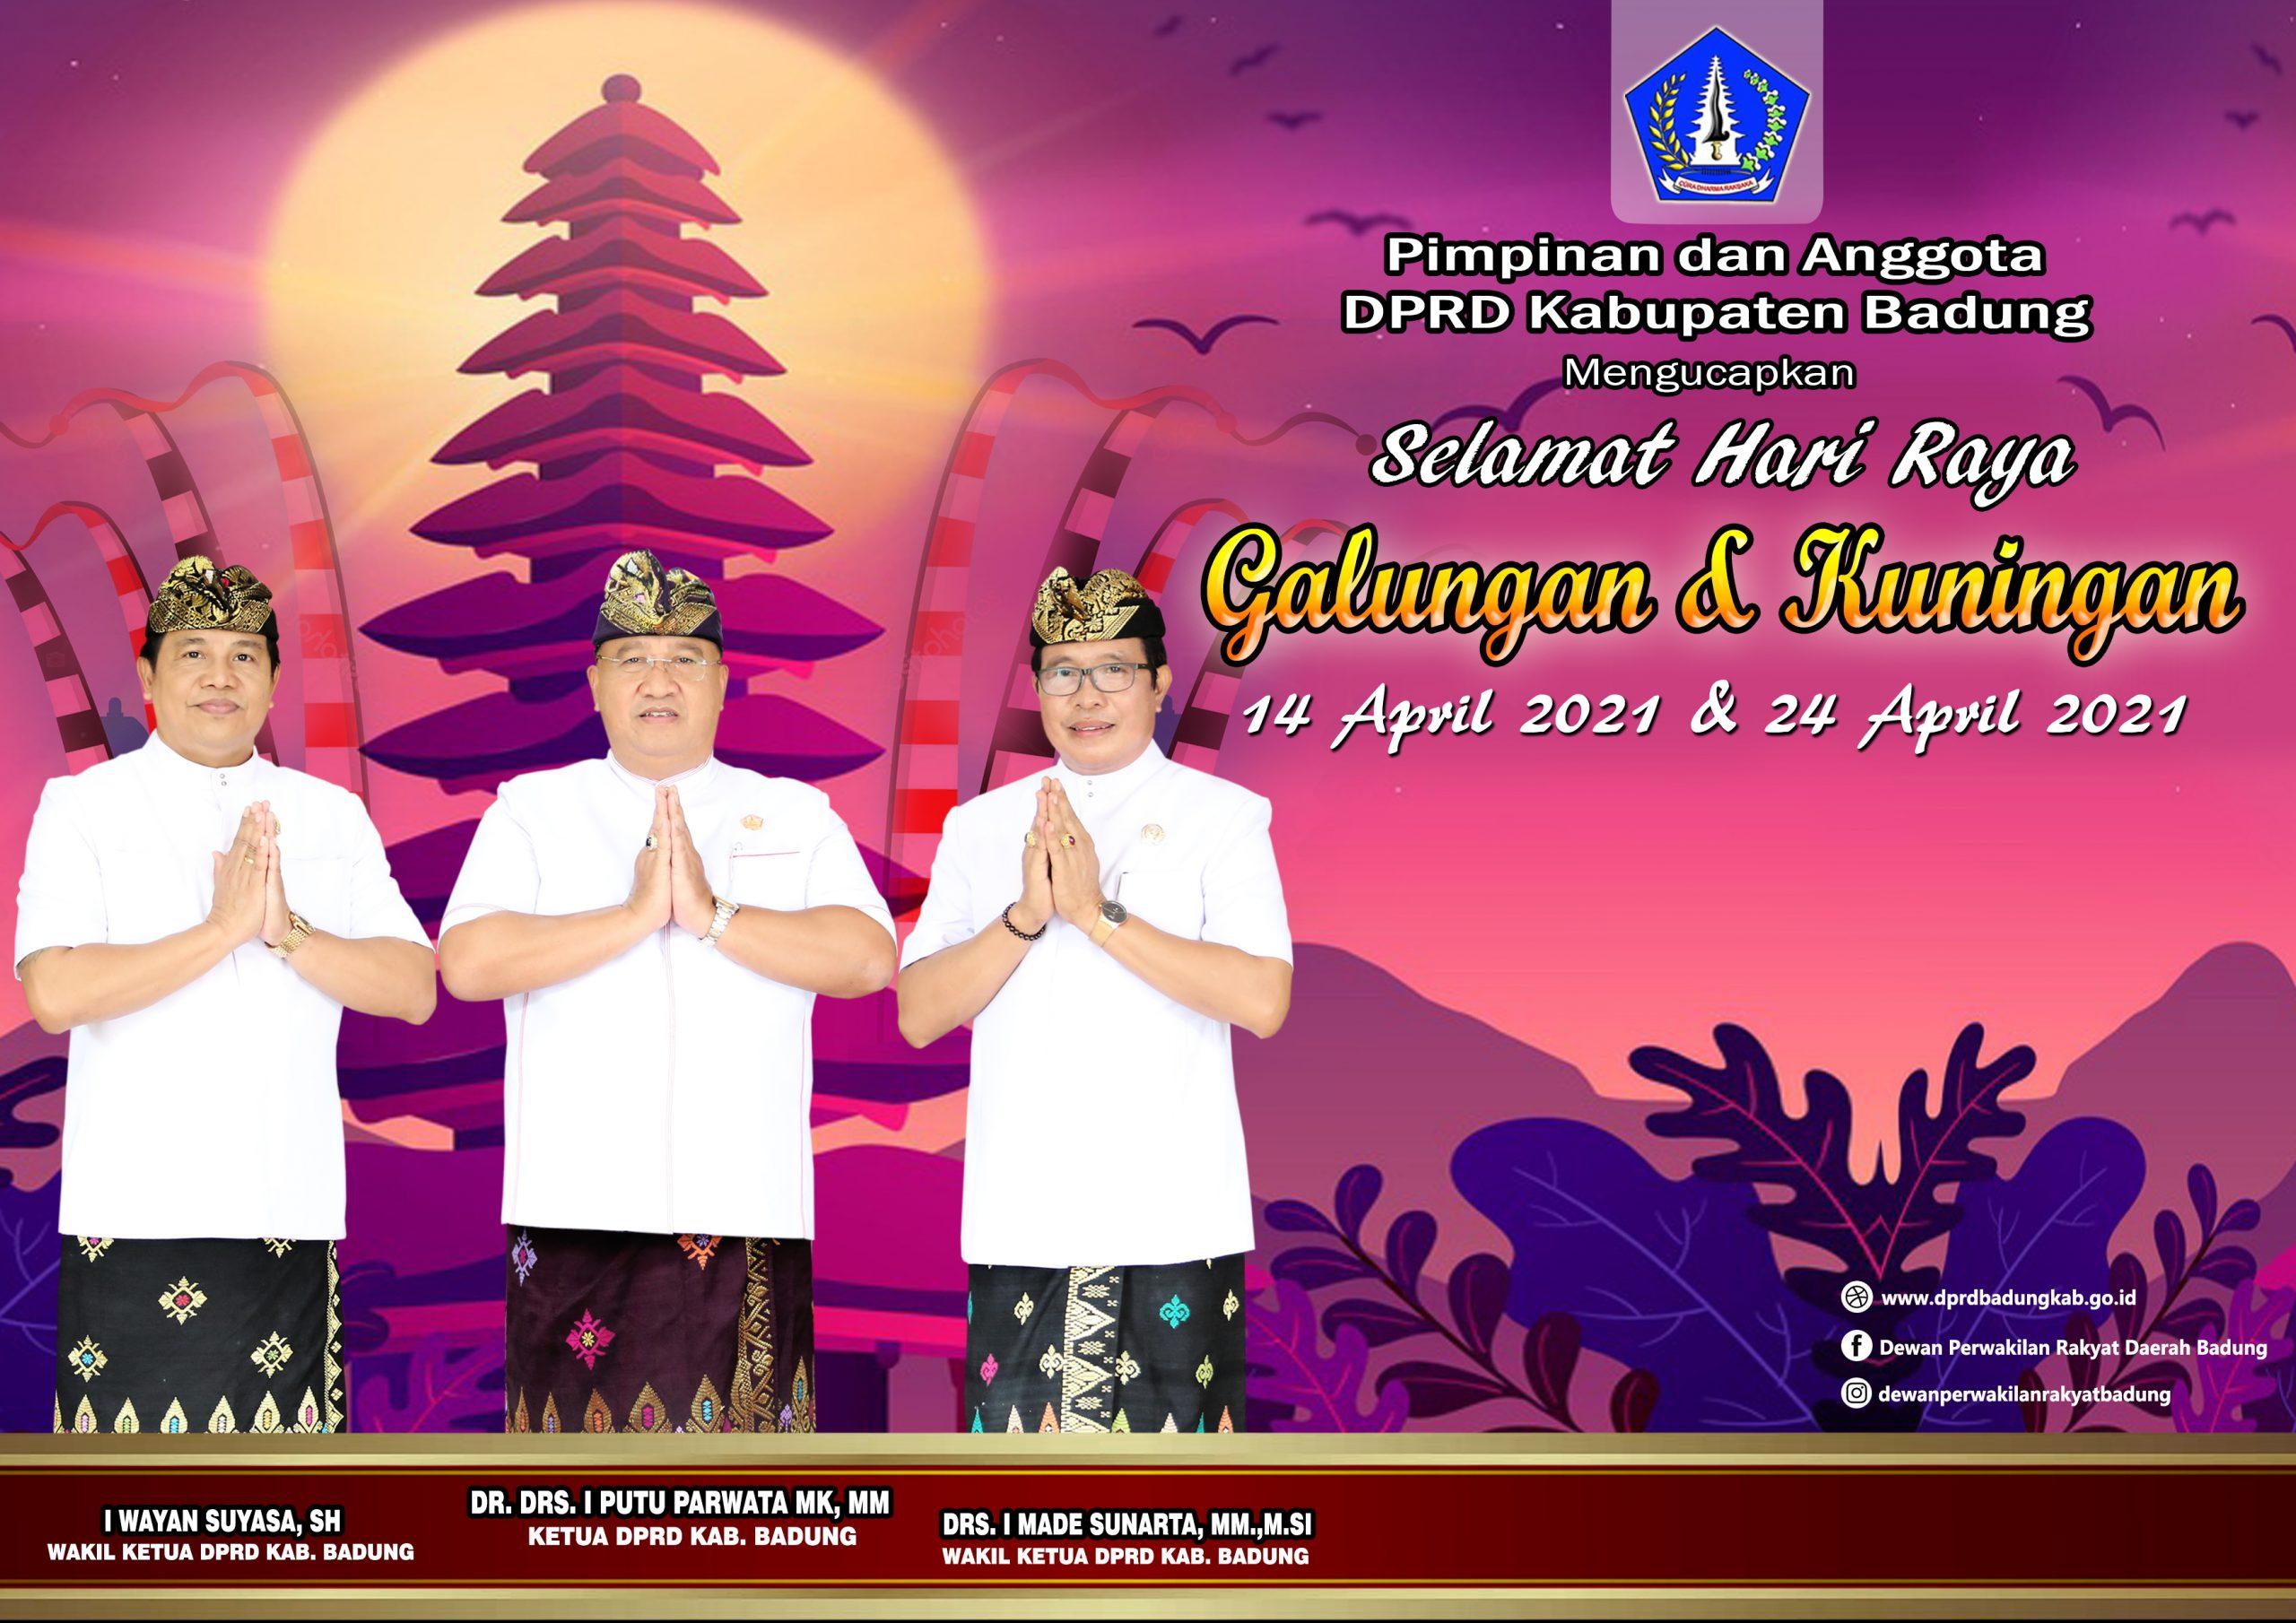 Iklan DPRD Badung Selamat Hari Raya Galungan April 2021